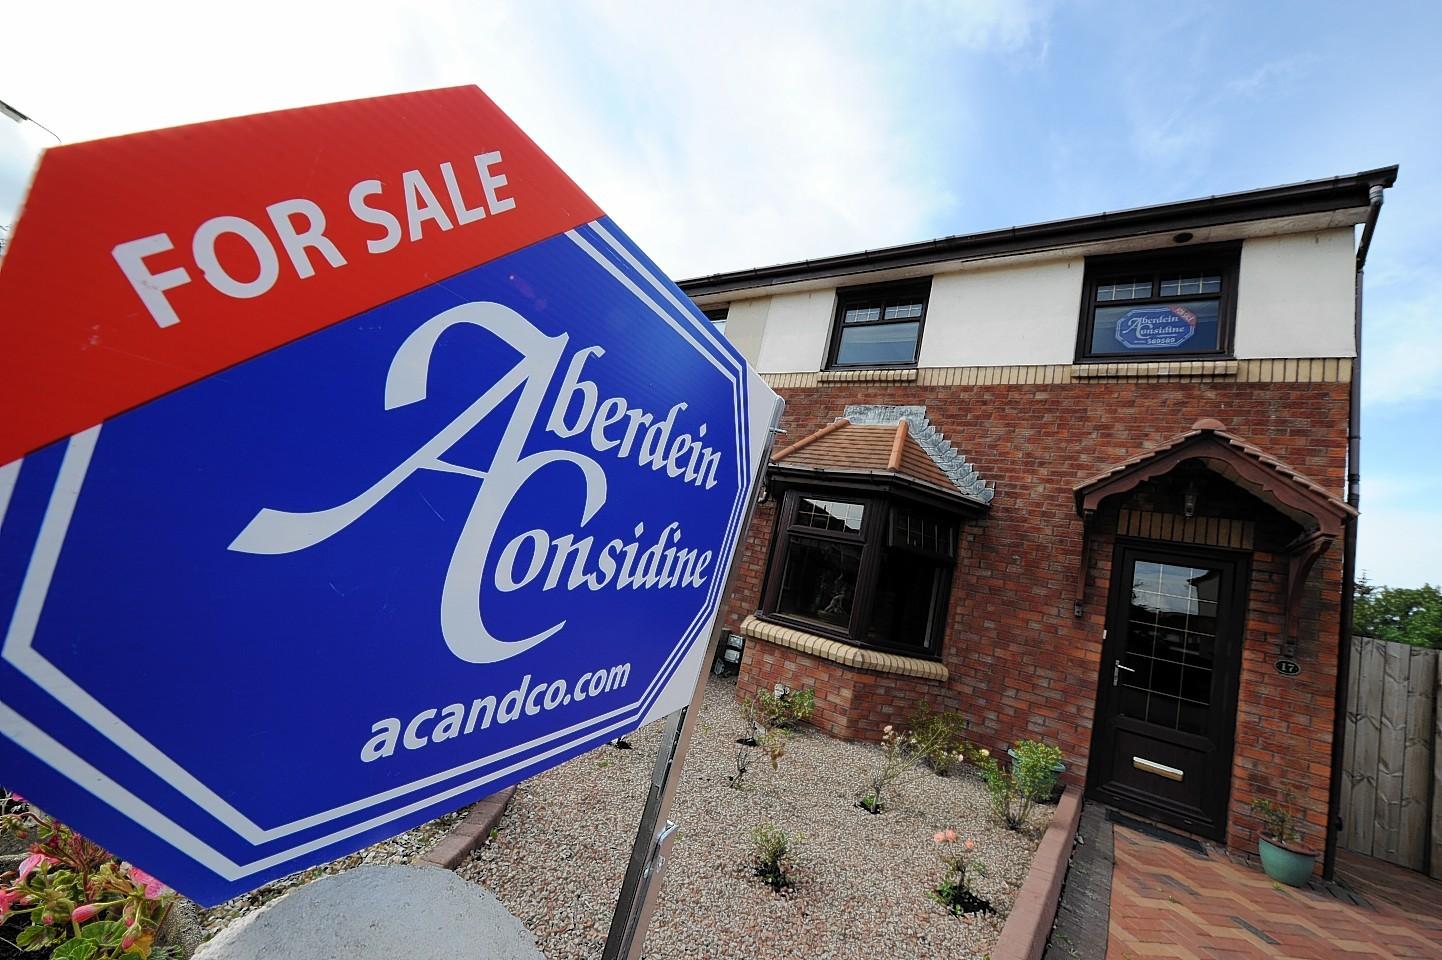 Aberdeen house prices